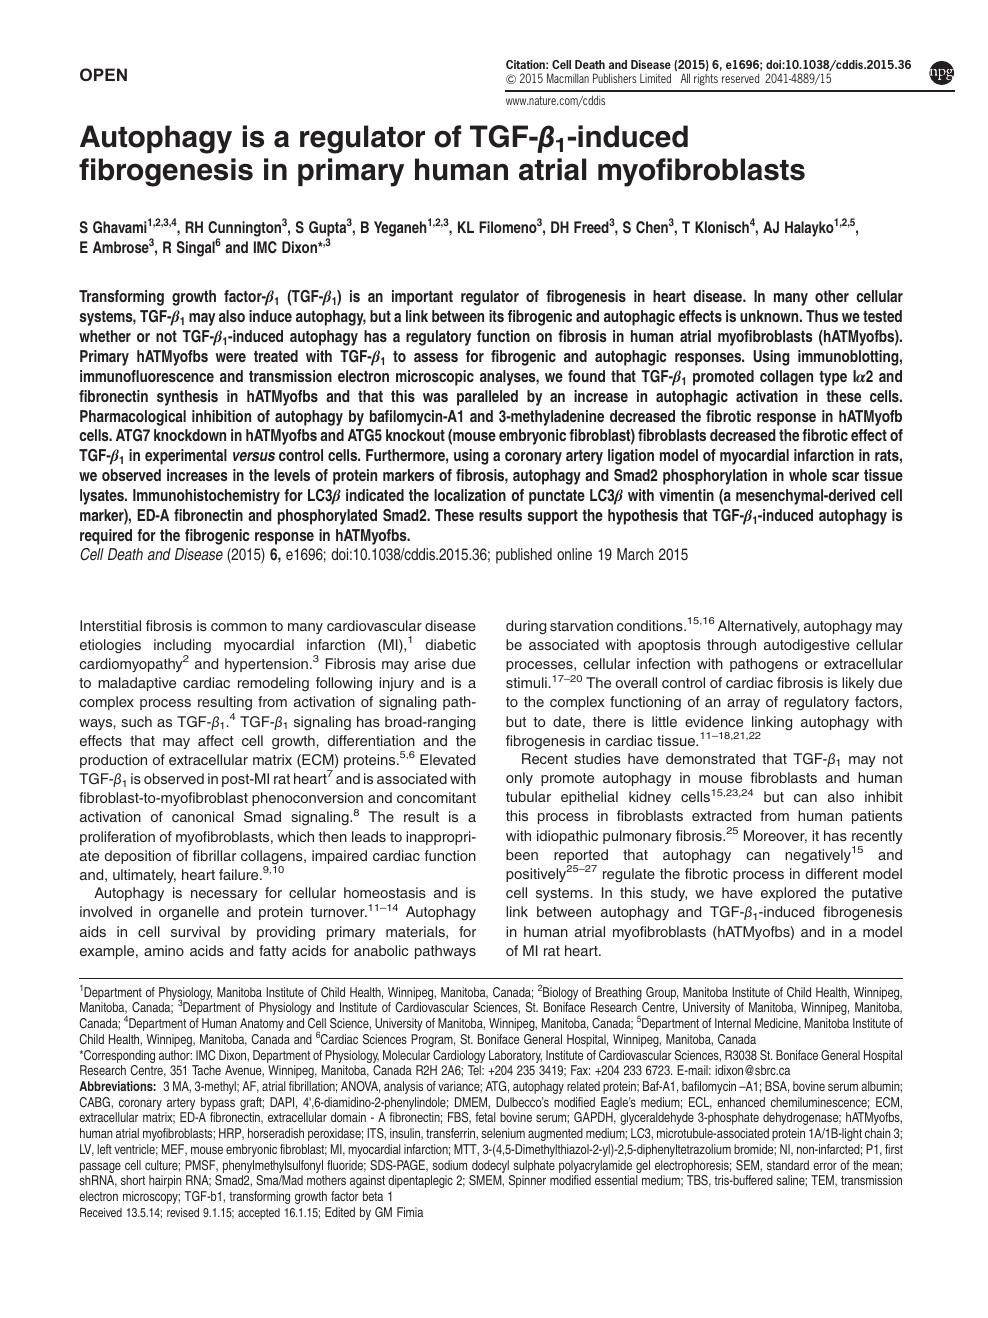 Autophagy is a regulator of TGF-β1-induced fibrogenesis in